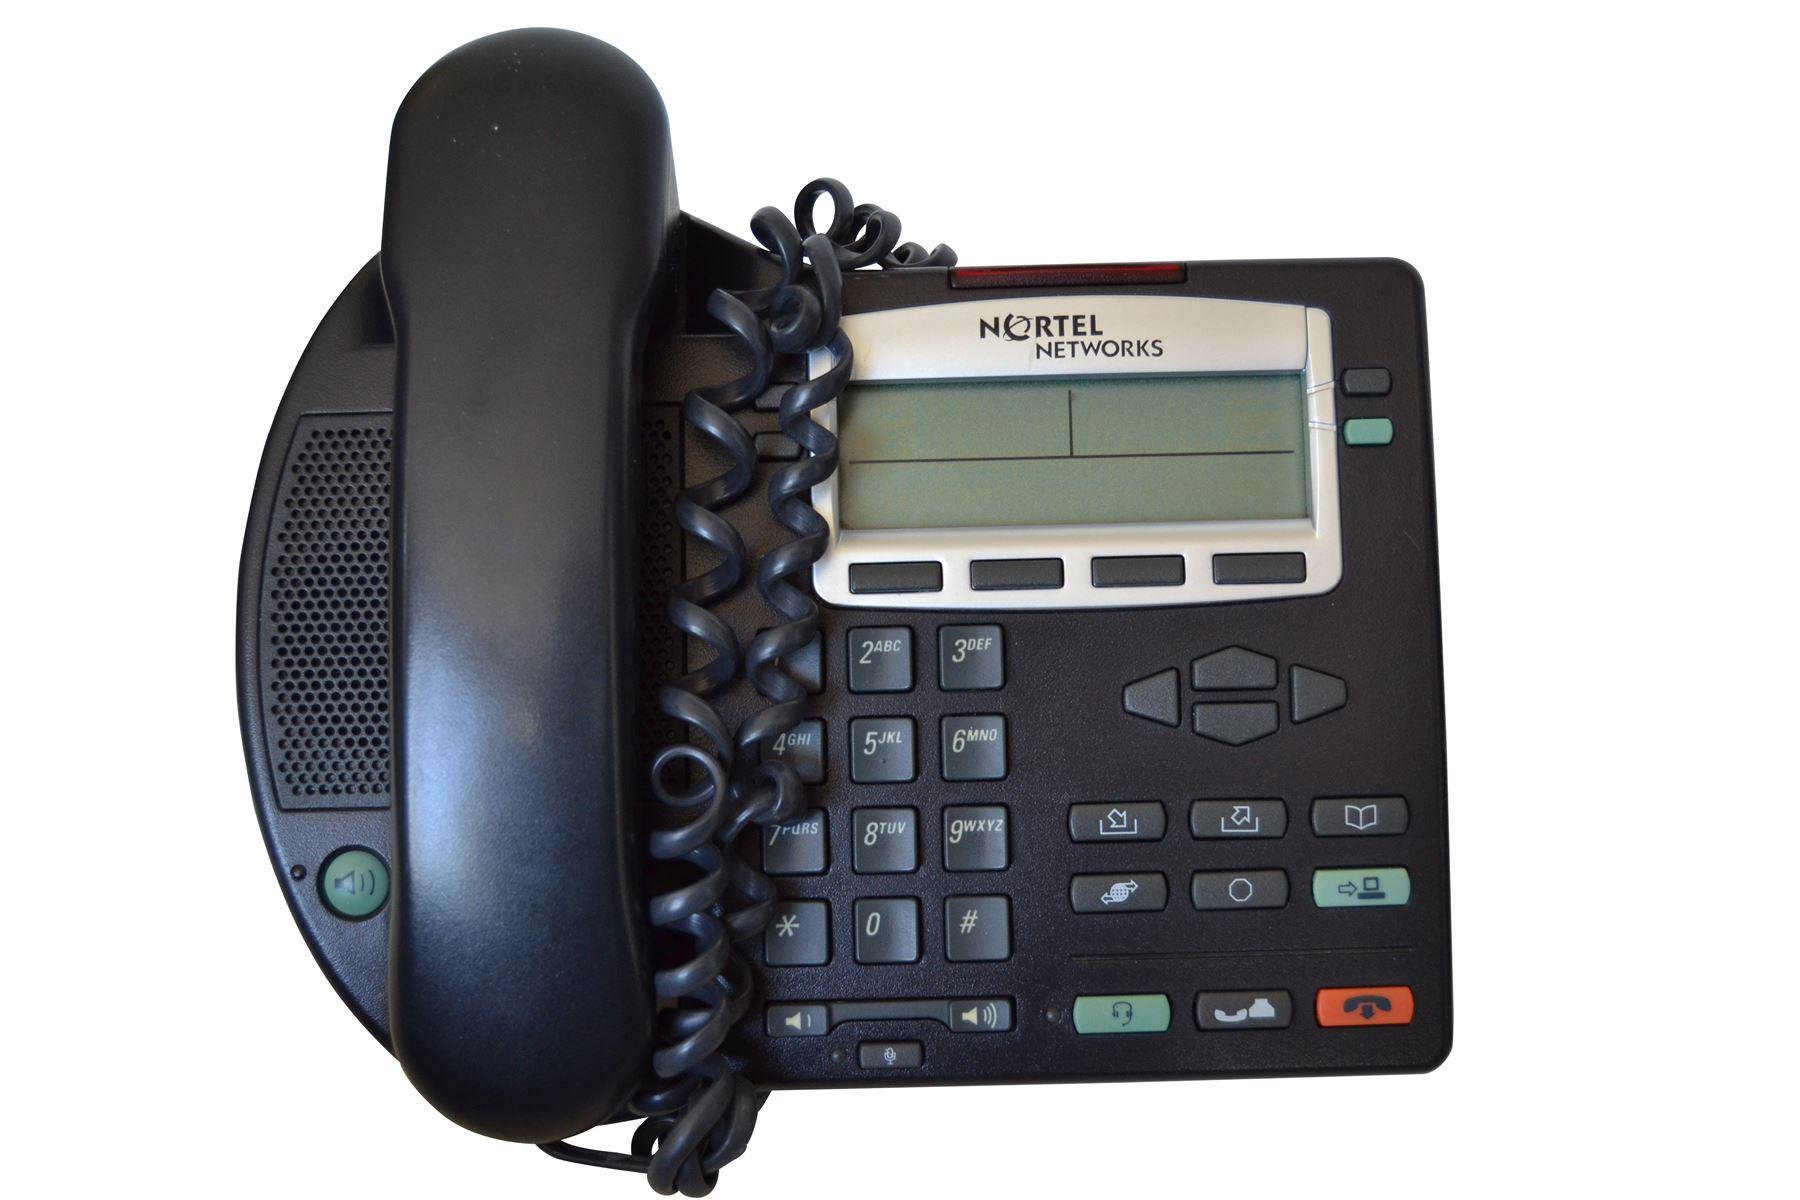 Nortel i2001 IP Phone in Black NTDU90 1 Year Warranty